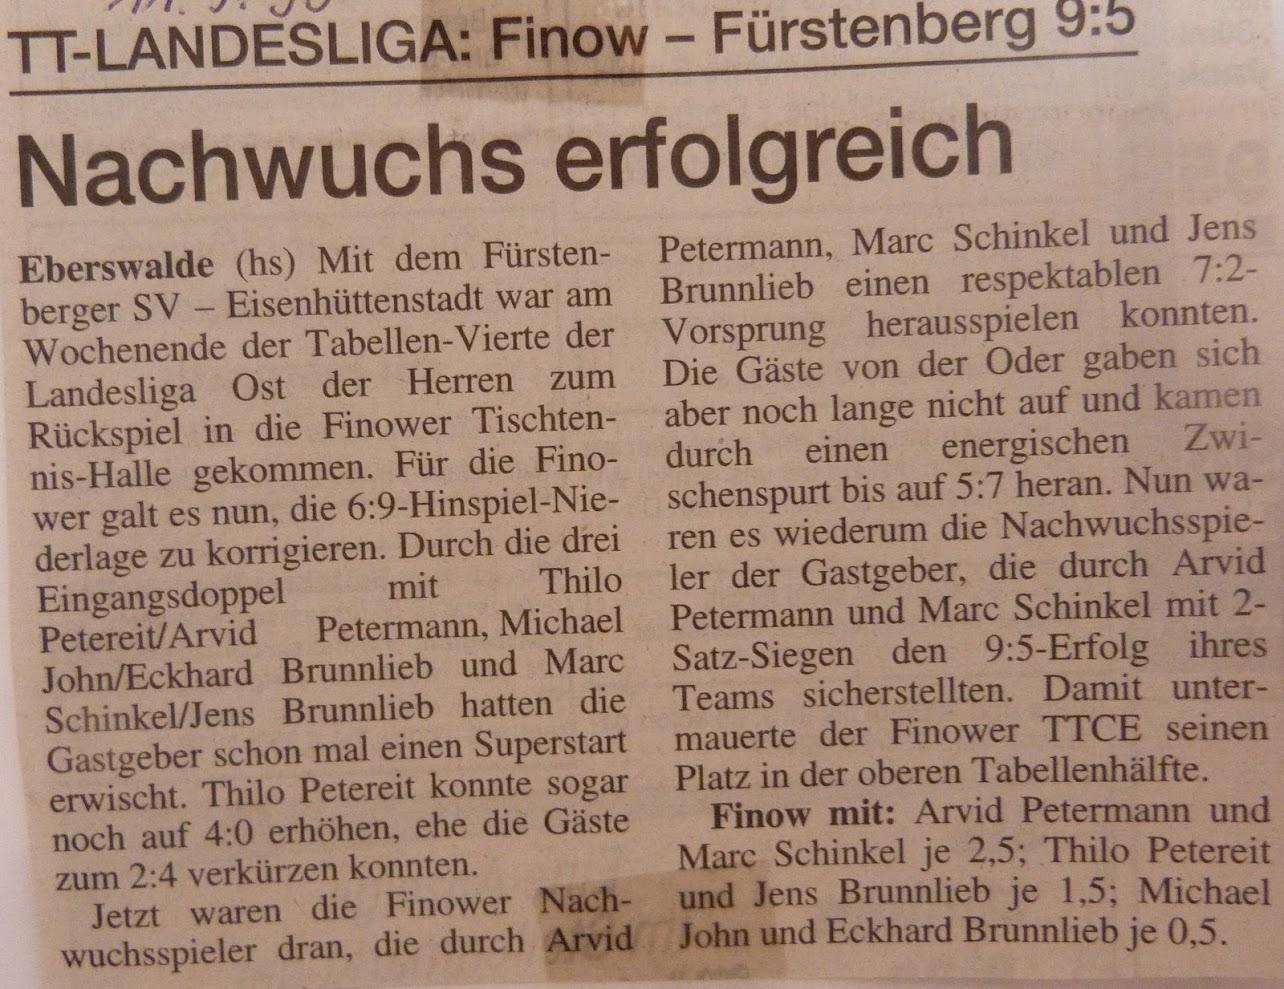 1998_03_11 Nachwuchs erfolgreich (LL)